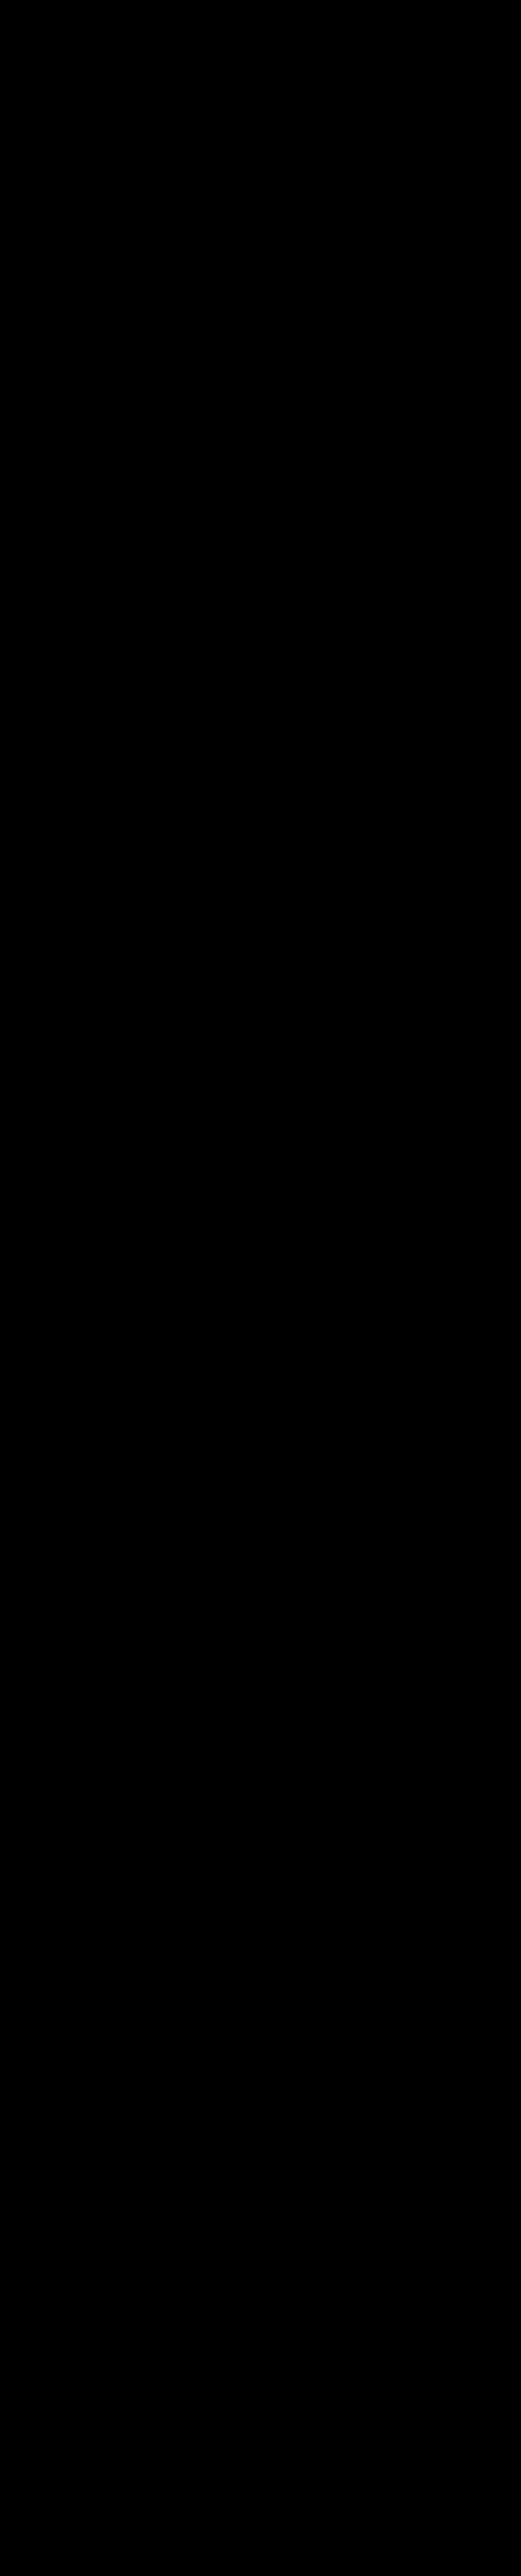 bebasi-part-1